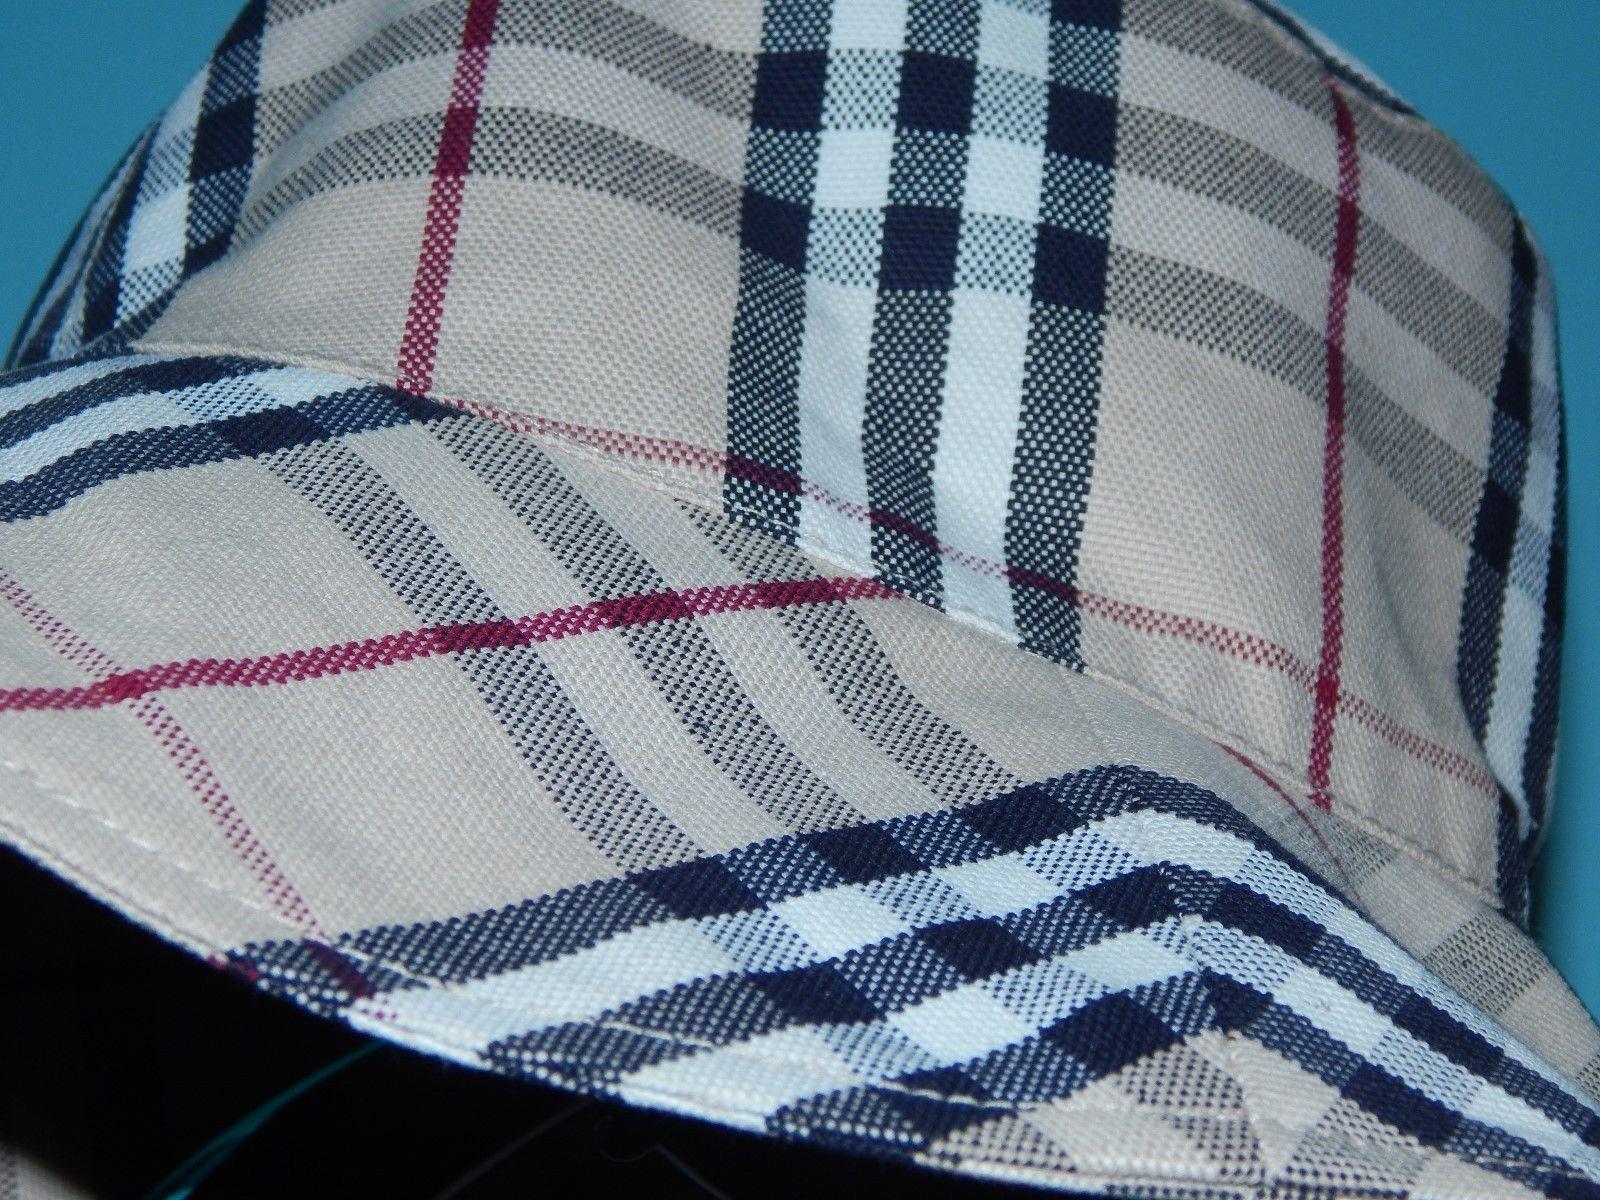 2e8d57f38fd8e Genuine BURBERRY LONDON Nova Check Hat. Wide Brim Floppy Cotton. Size M.  Rare